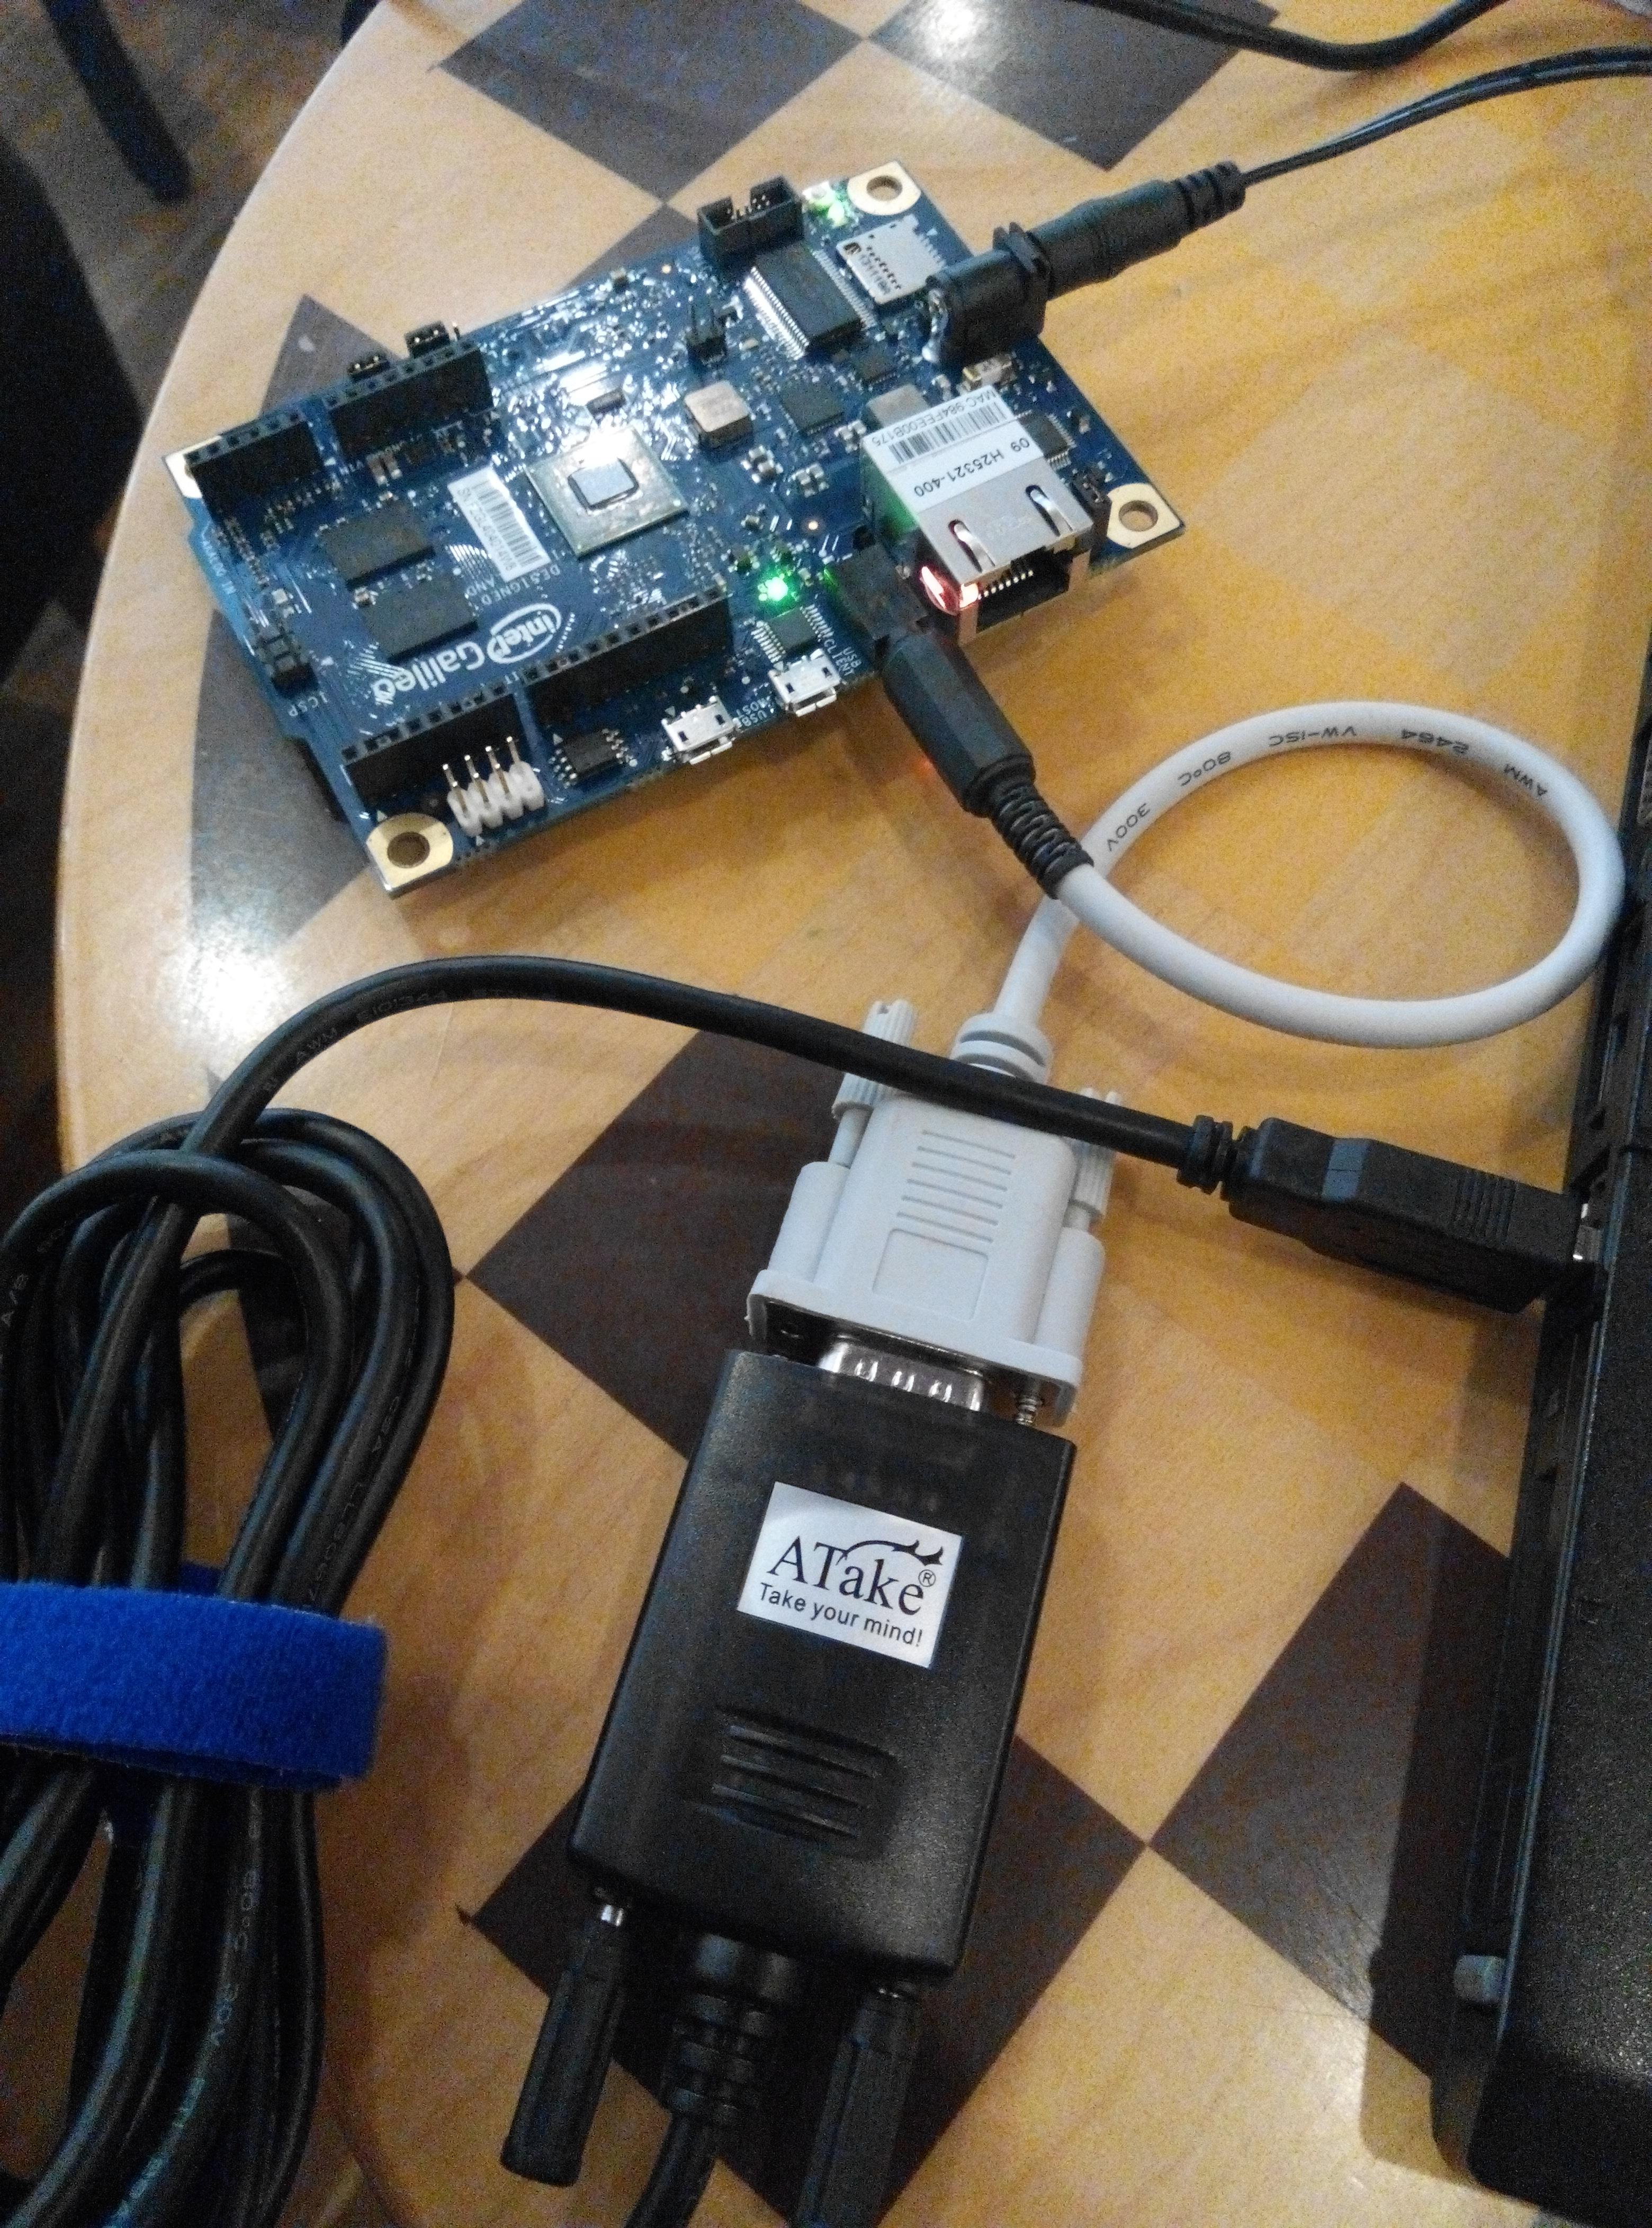 ATAKE USB TO RS232 DRIVERS FOR WINDOWS 10